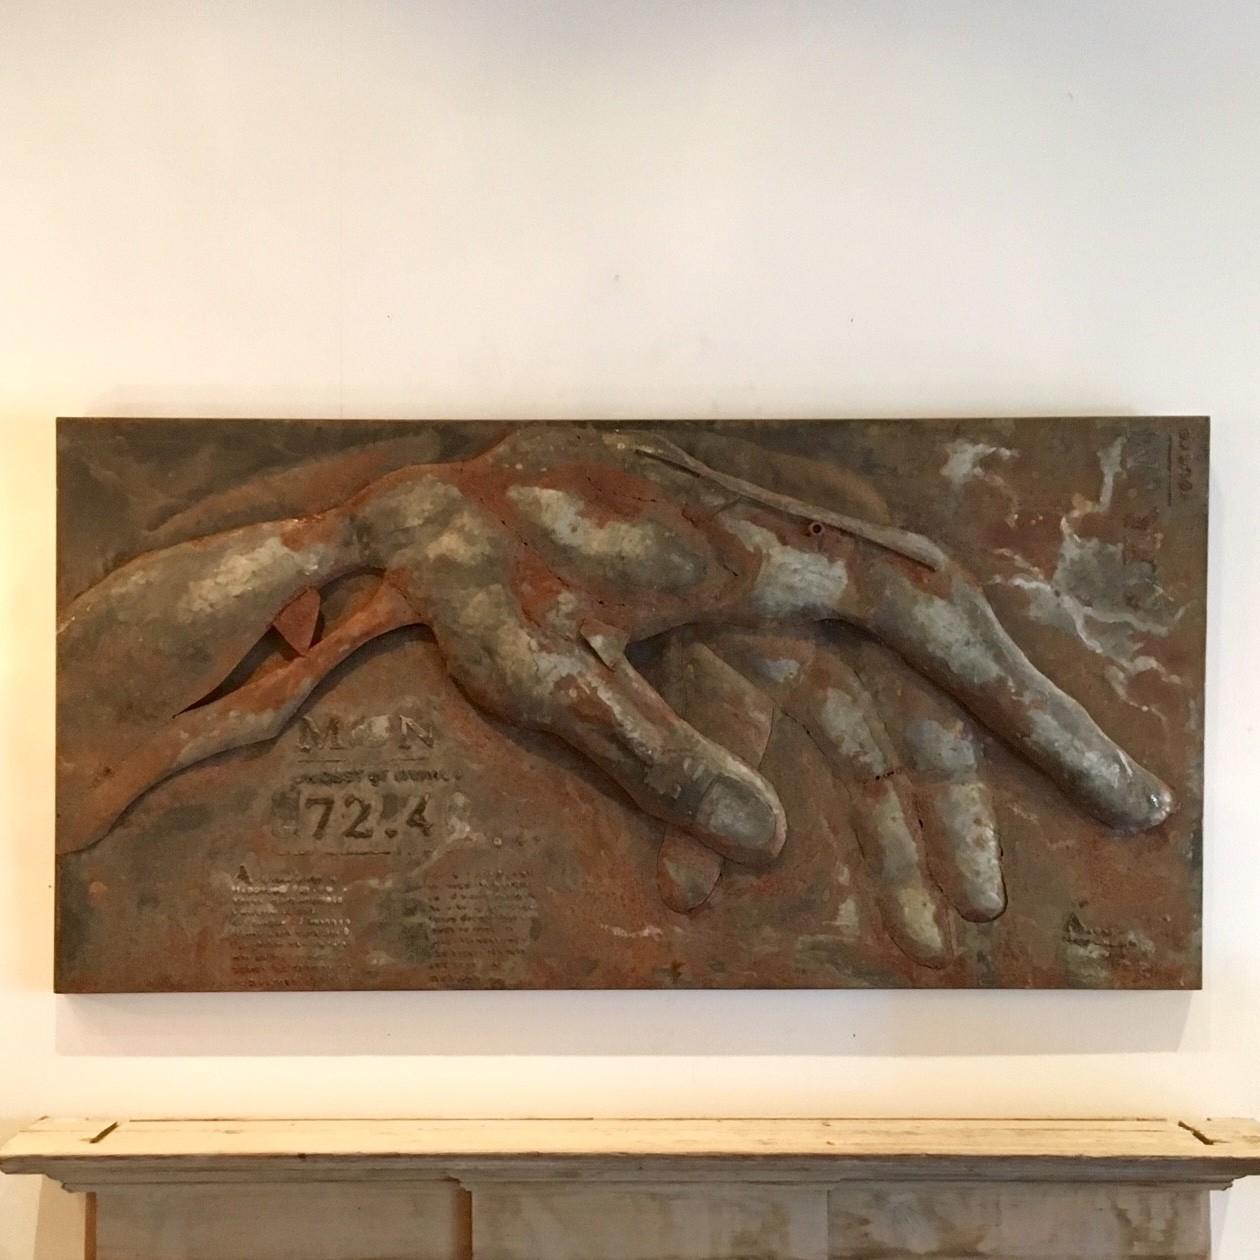 Rusty wall sculpture of a hand